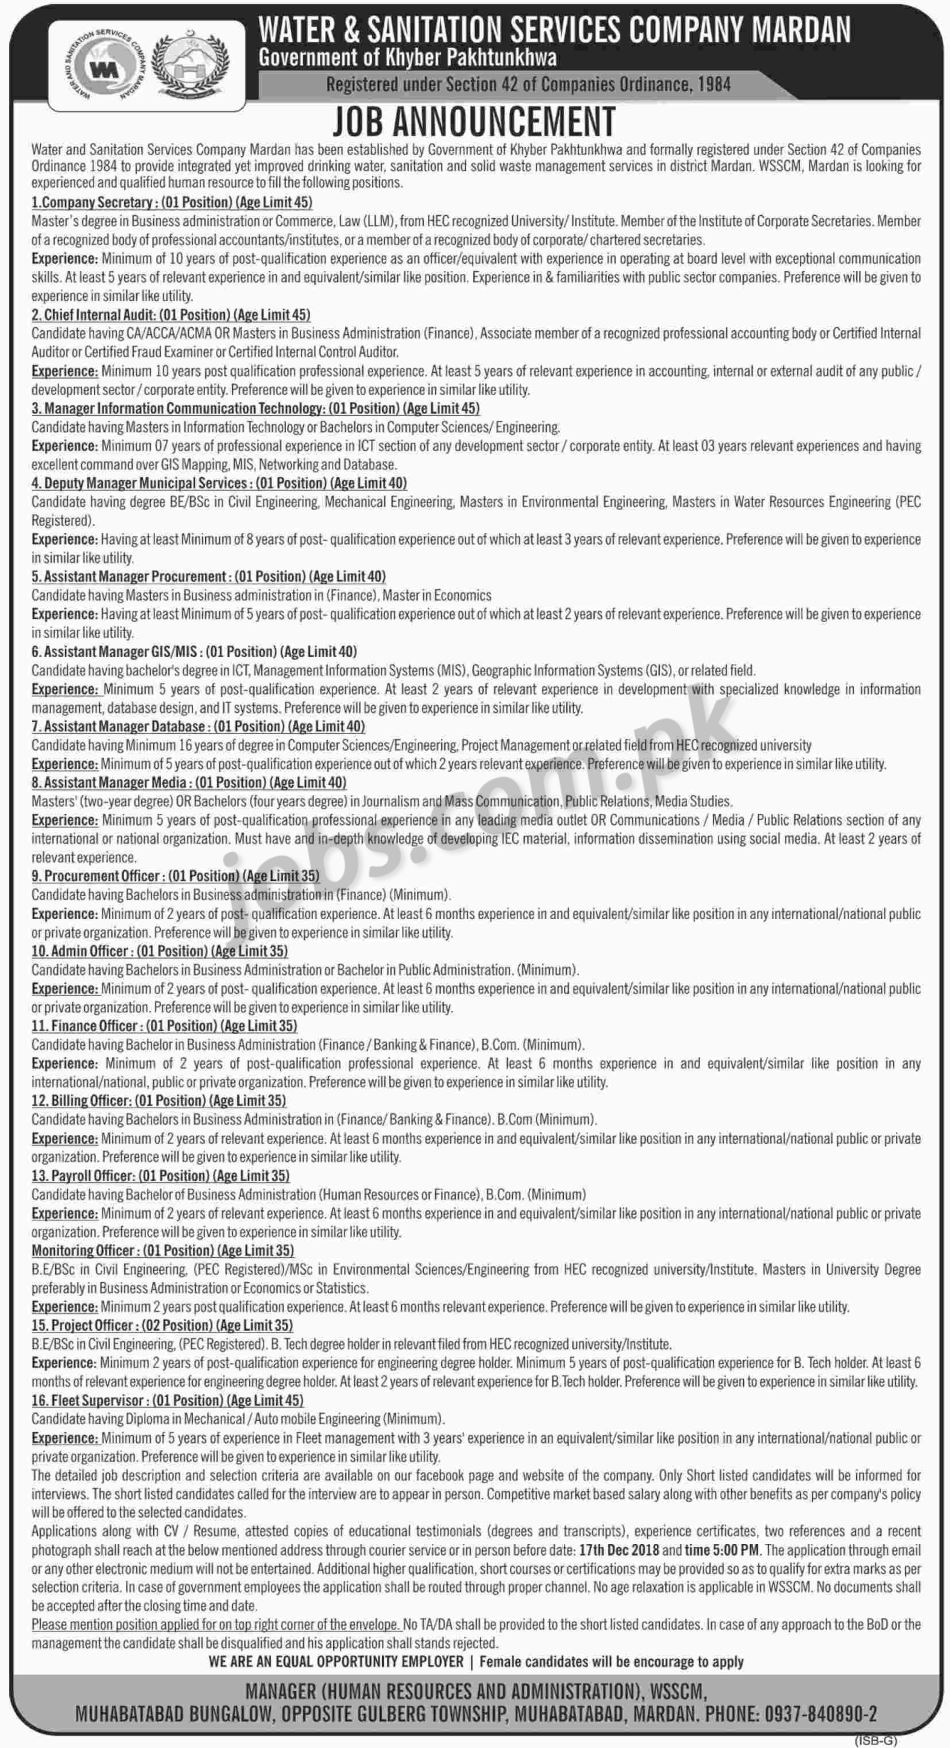 water board jobs application form